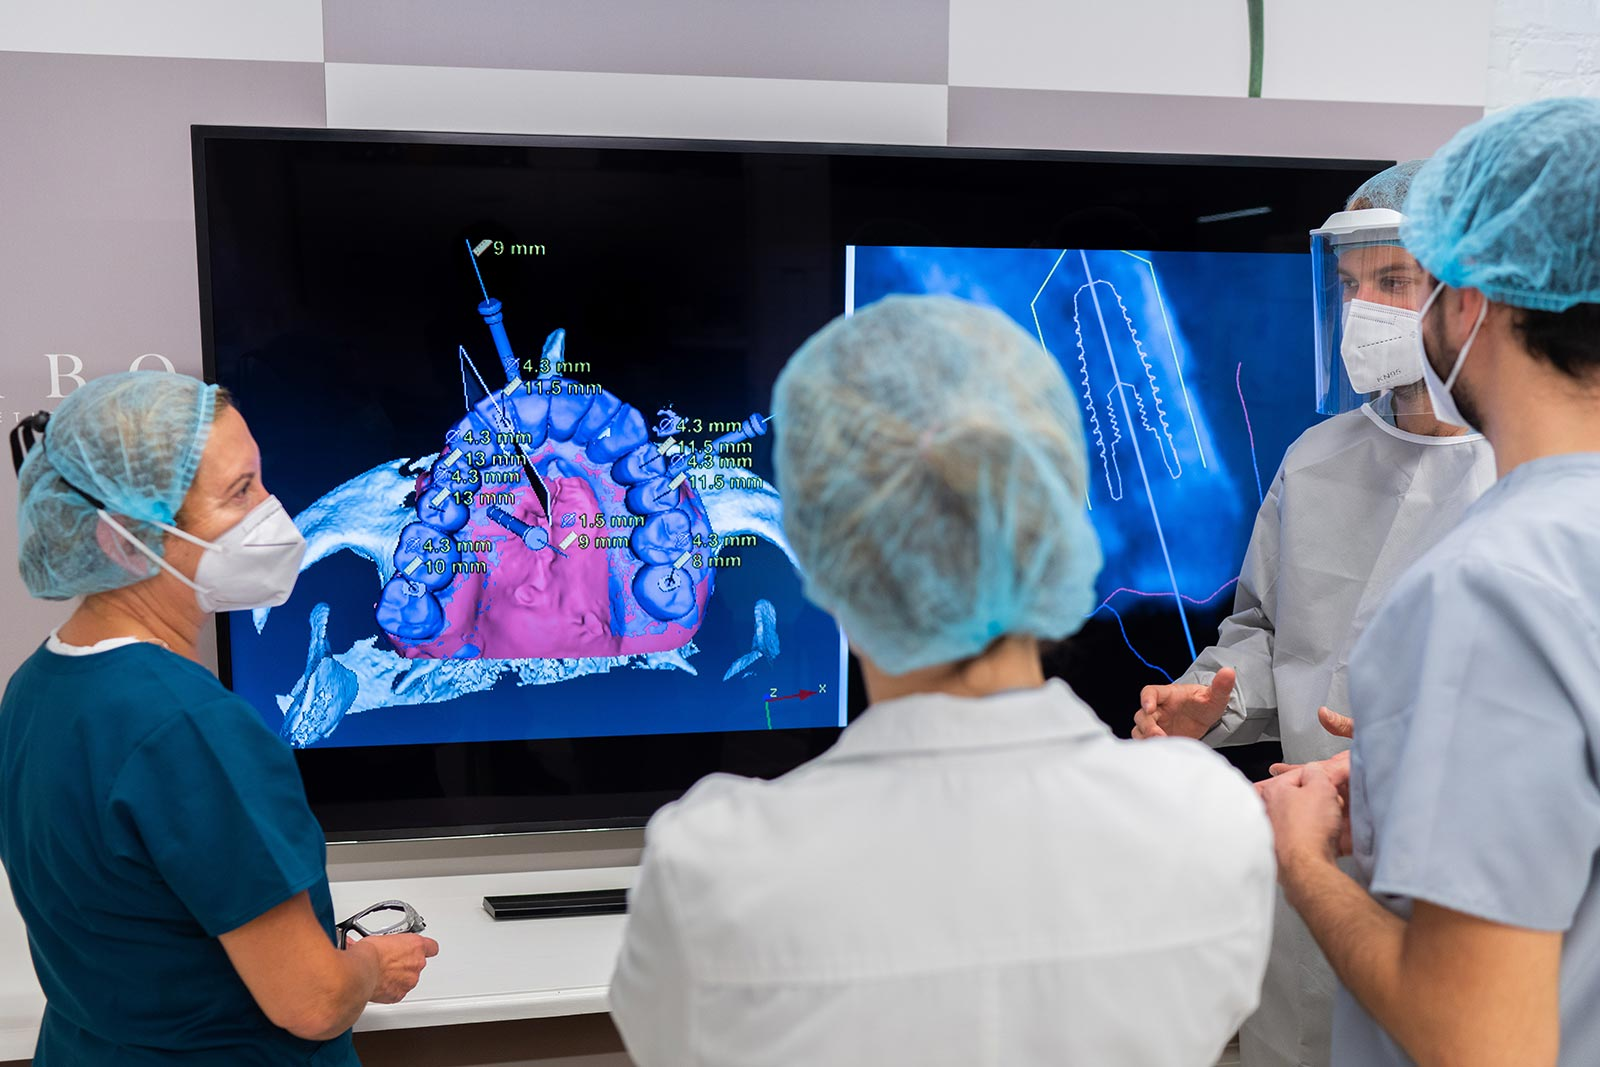 Cirugía guiada por ordenador - Clínica Vilaboa